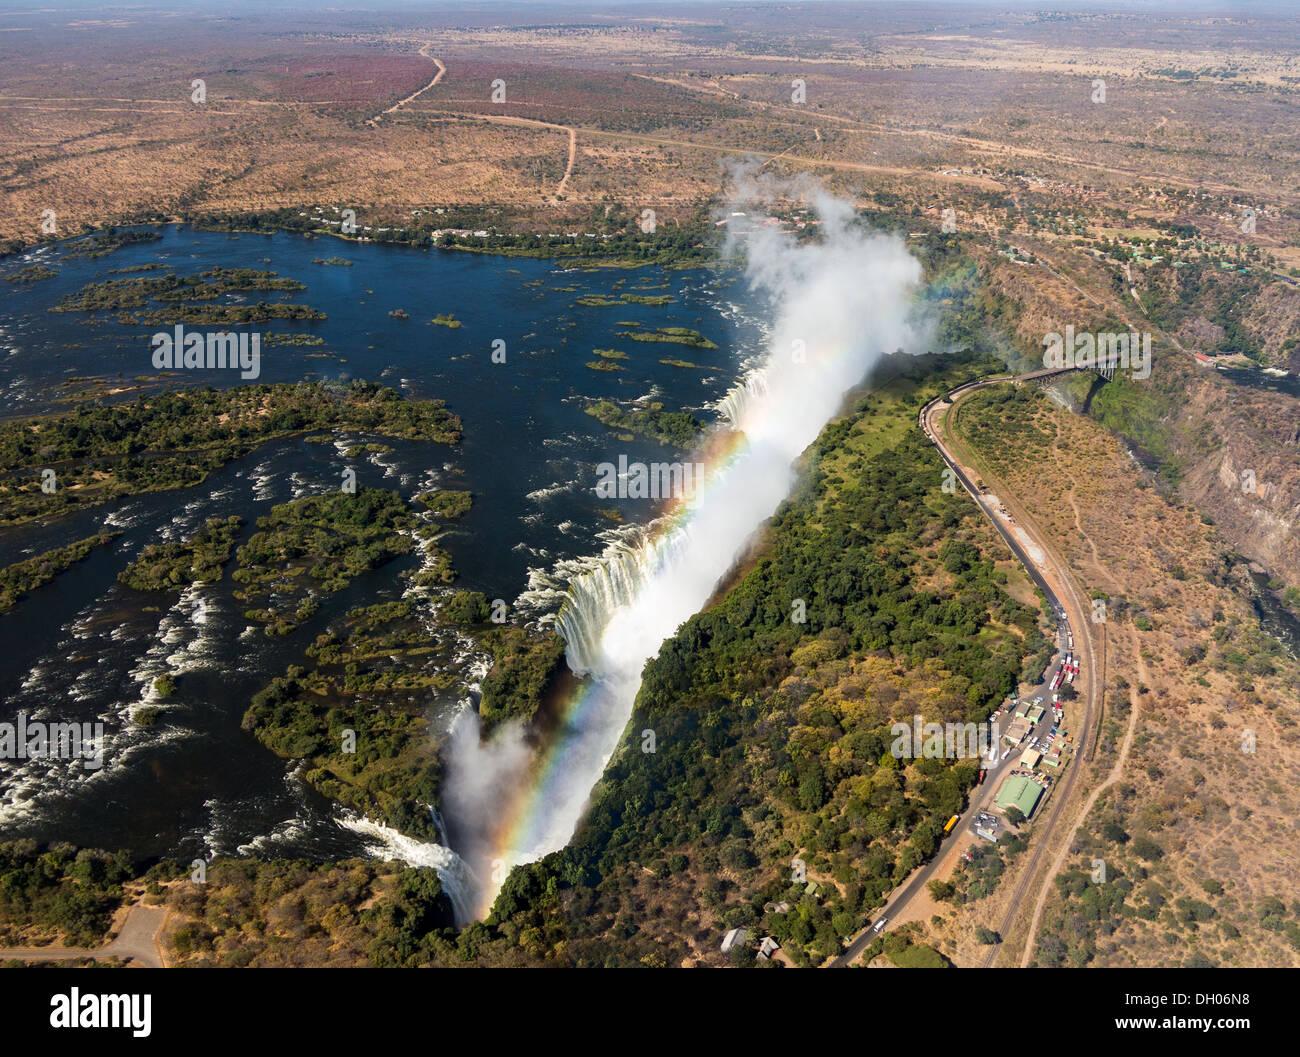 Viktoriafälle am Sambesi, Luftaufnahme mit Regenbogen Stockfoto